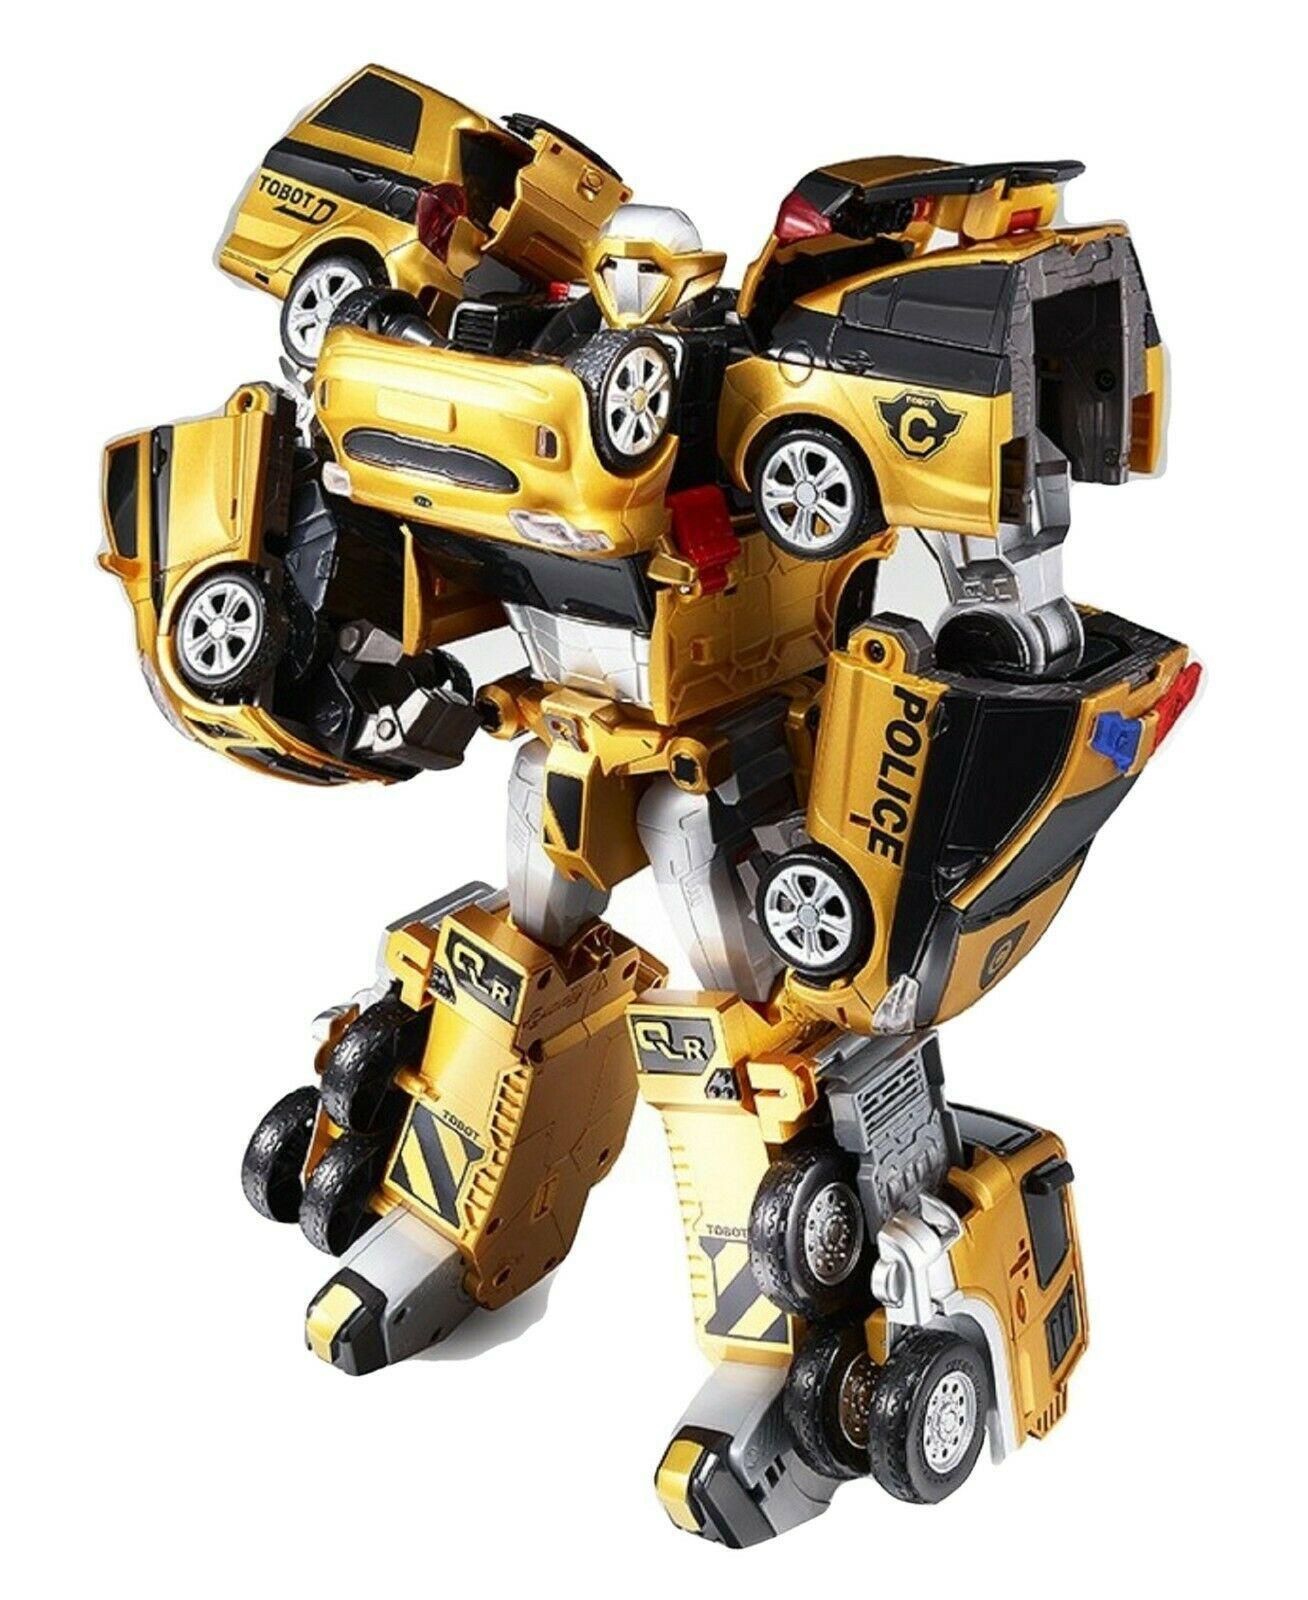 Tobot V Gold Quatran Toy Robot Transforming Transformation Action Figure